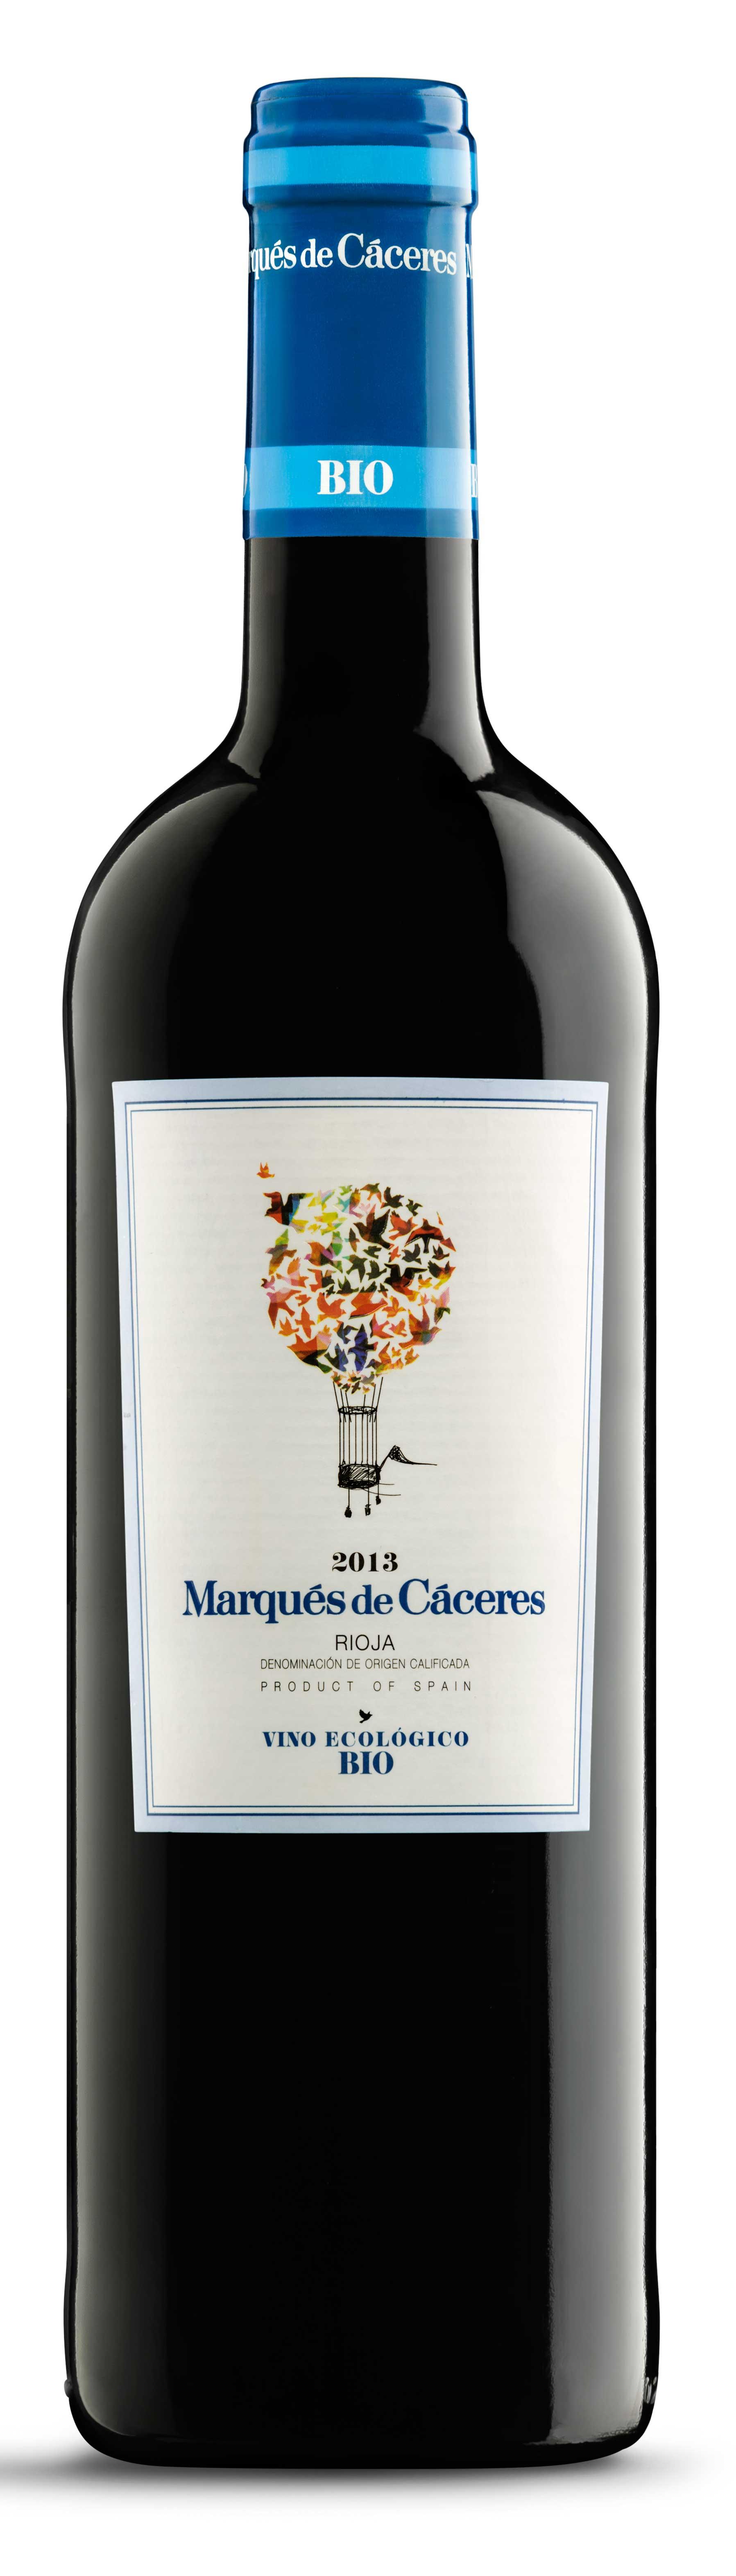 Vino Ecológico Bio ( Bodegas Marqués de Cáceres ) 2013